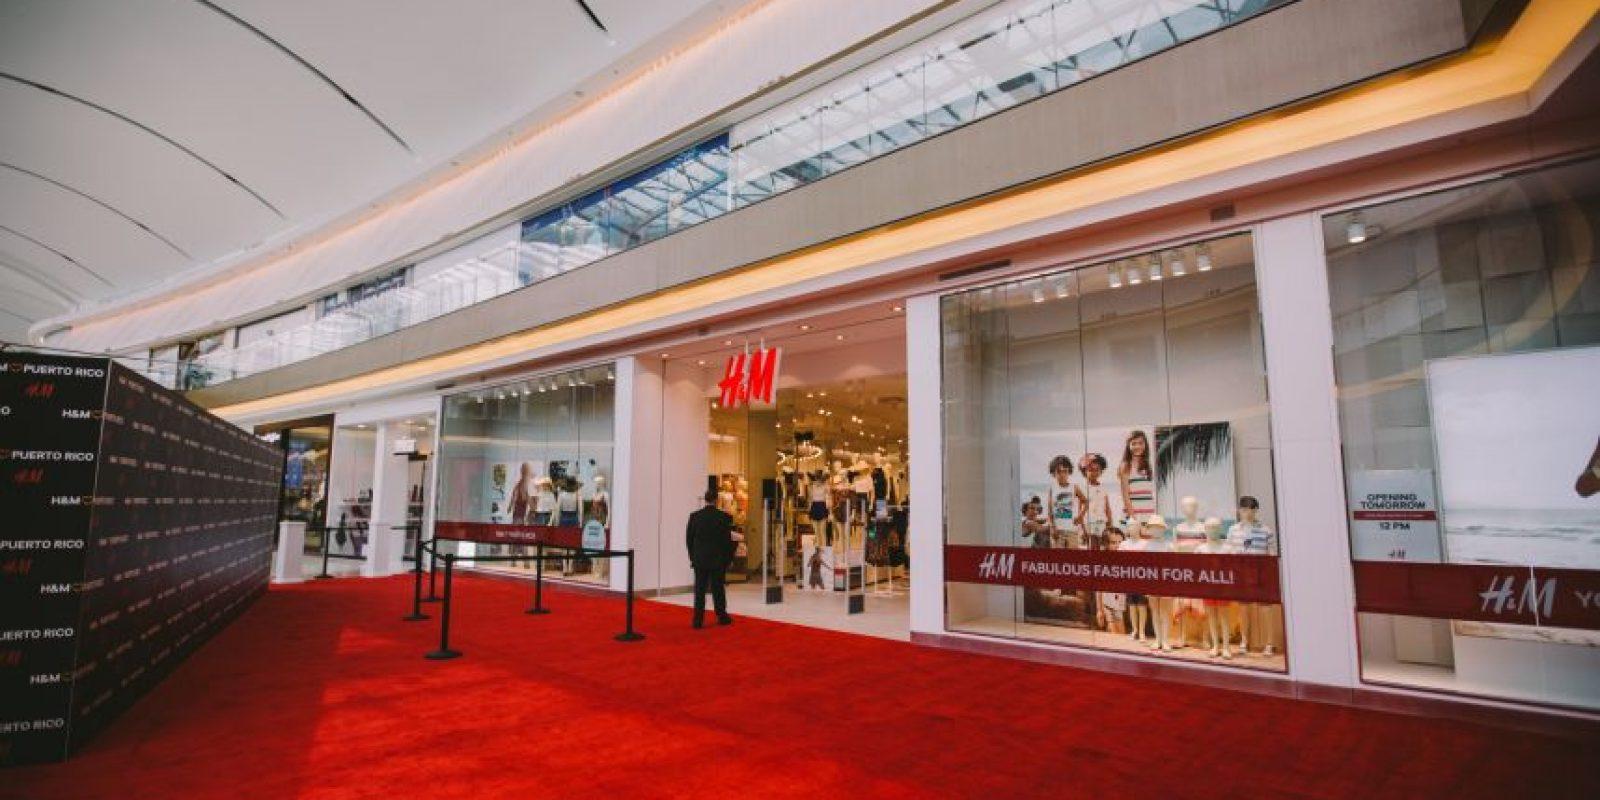 La entrada a la tienda de H&M en The Mall of San Juan. Foto:Suministrada: Worldjunkies. Imagen Por: